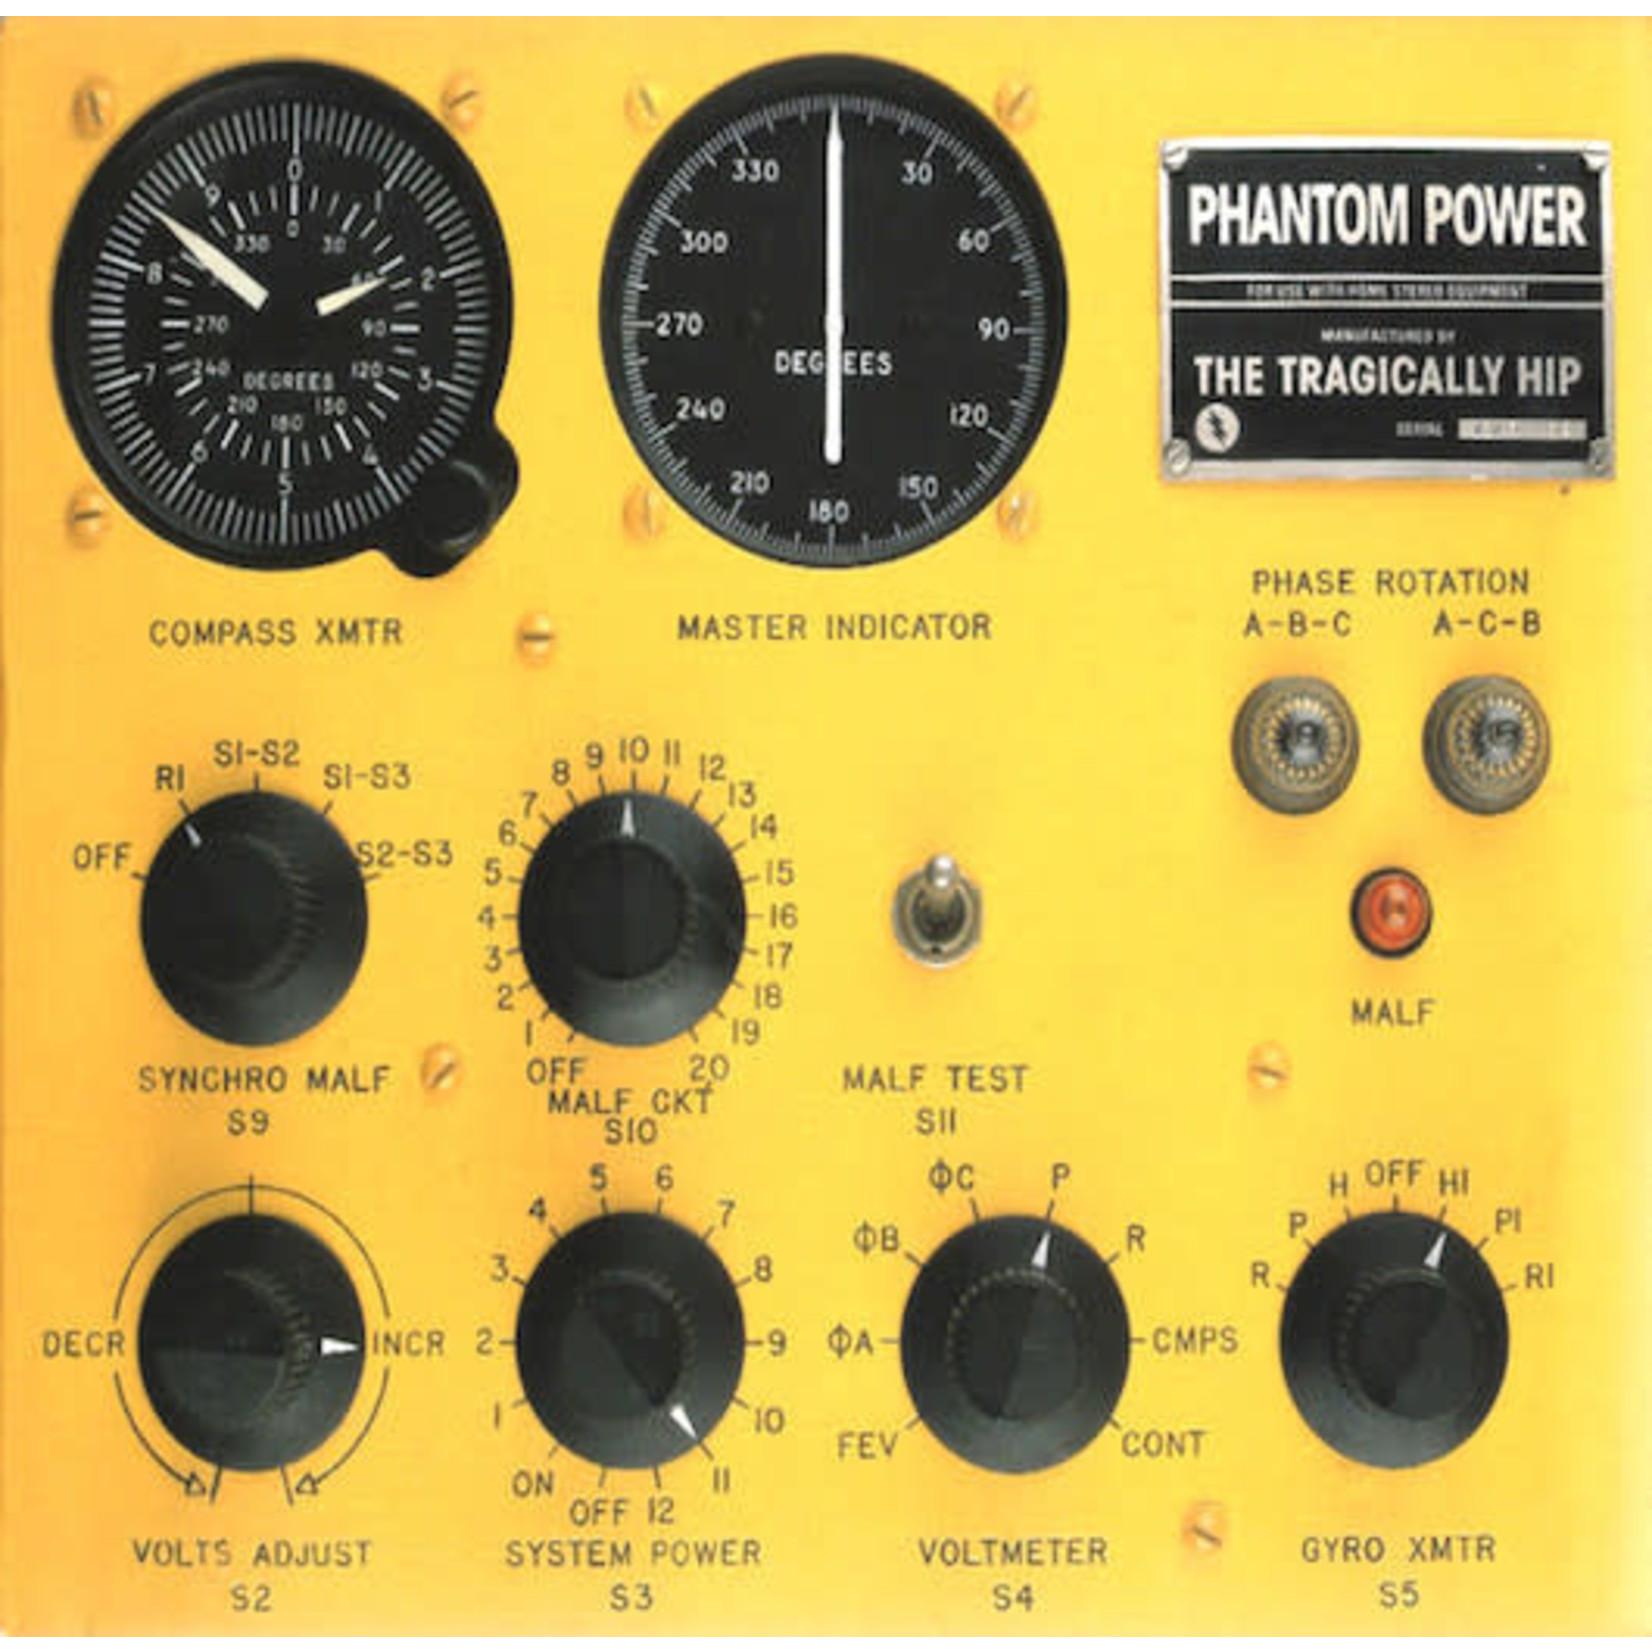 [New] Tragically Hip: Phantom Power (2LP)